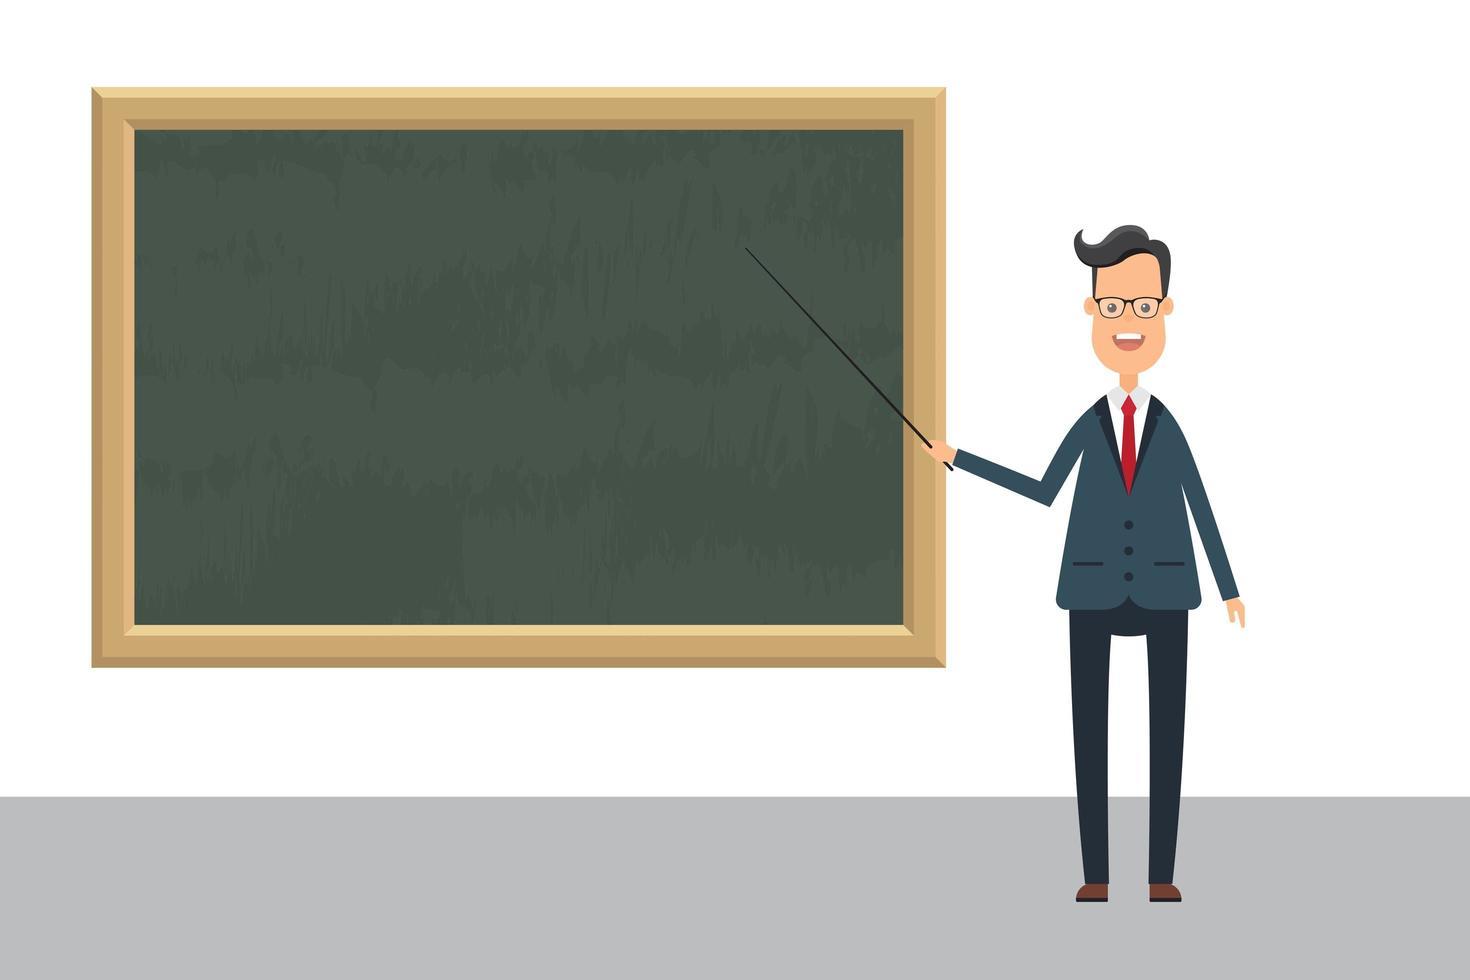 Profesor con puntero en pizarra vector